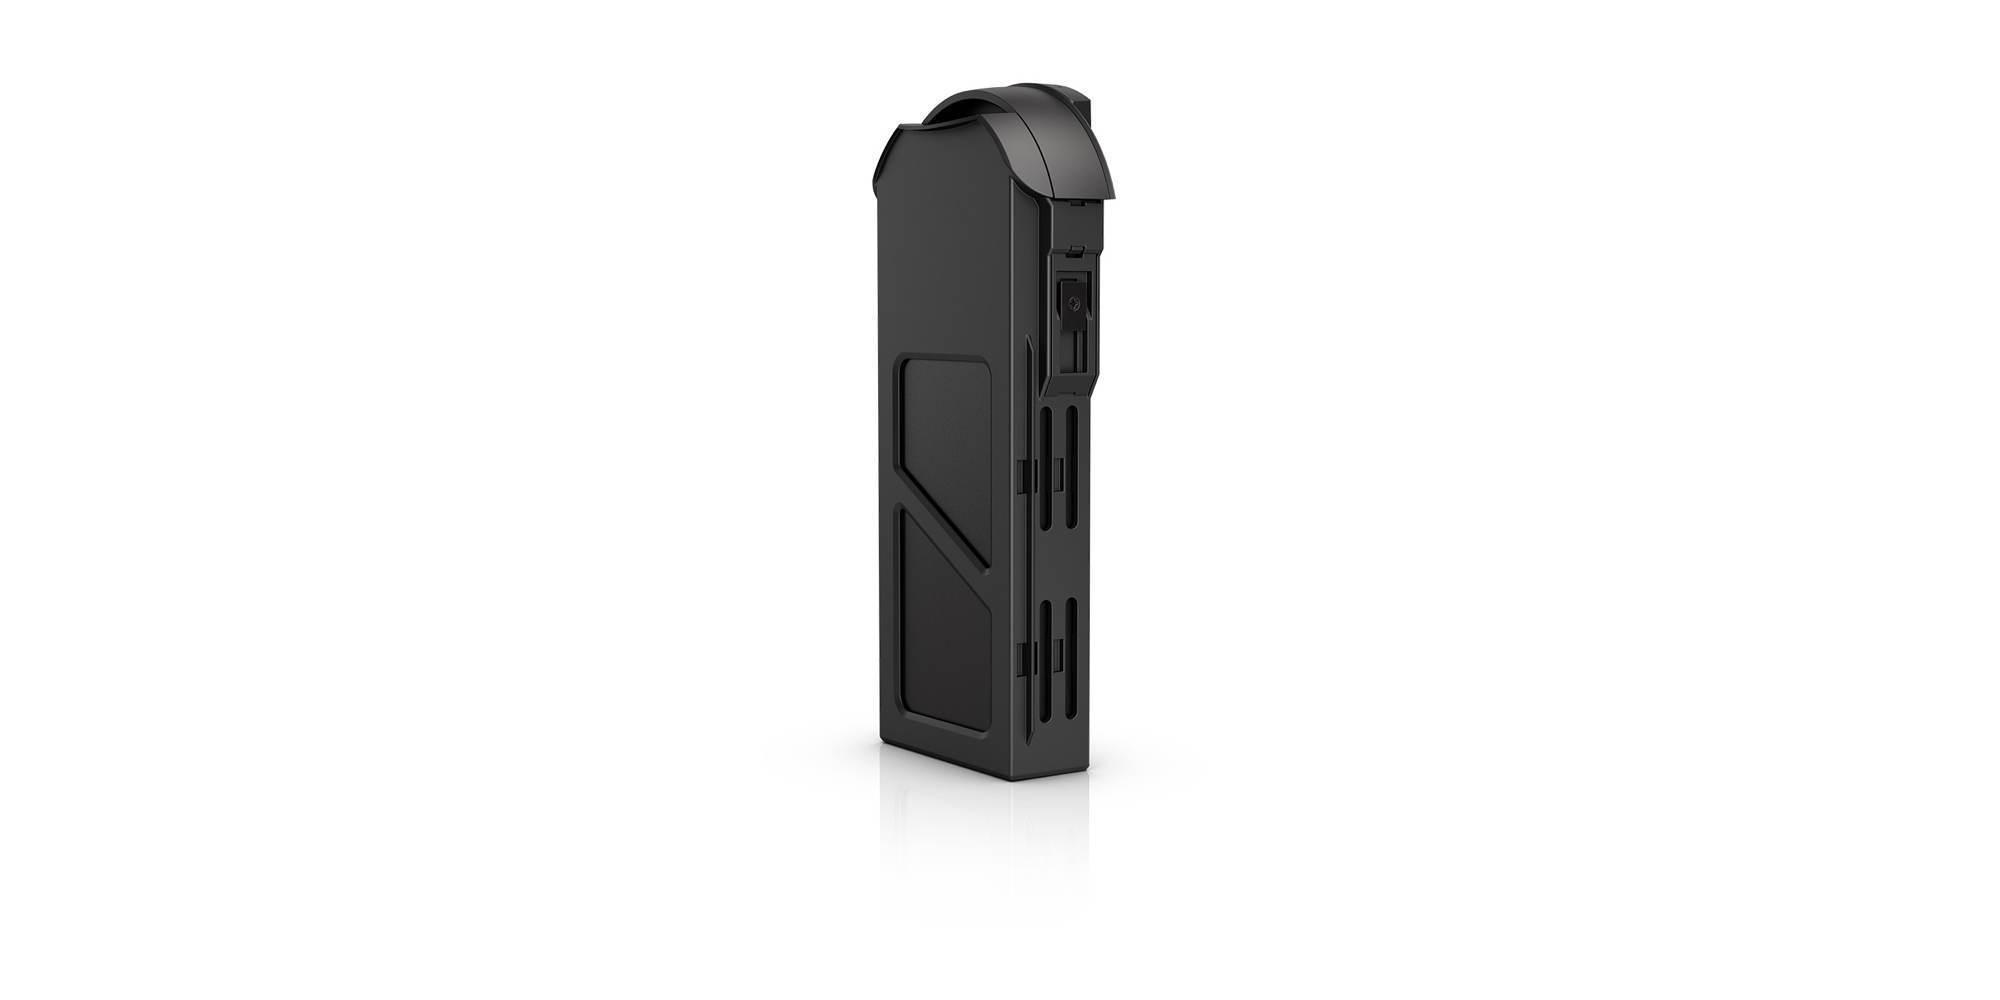 Аккумулятор GoPro Karma Battery (AQBTY-001) вид слева